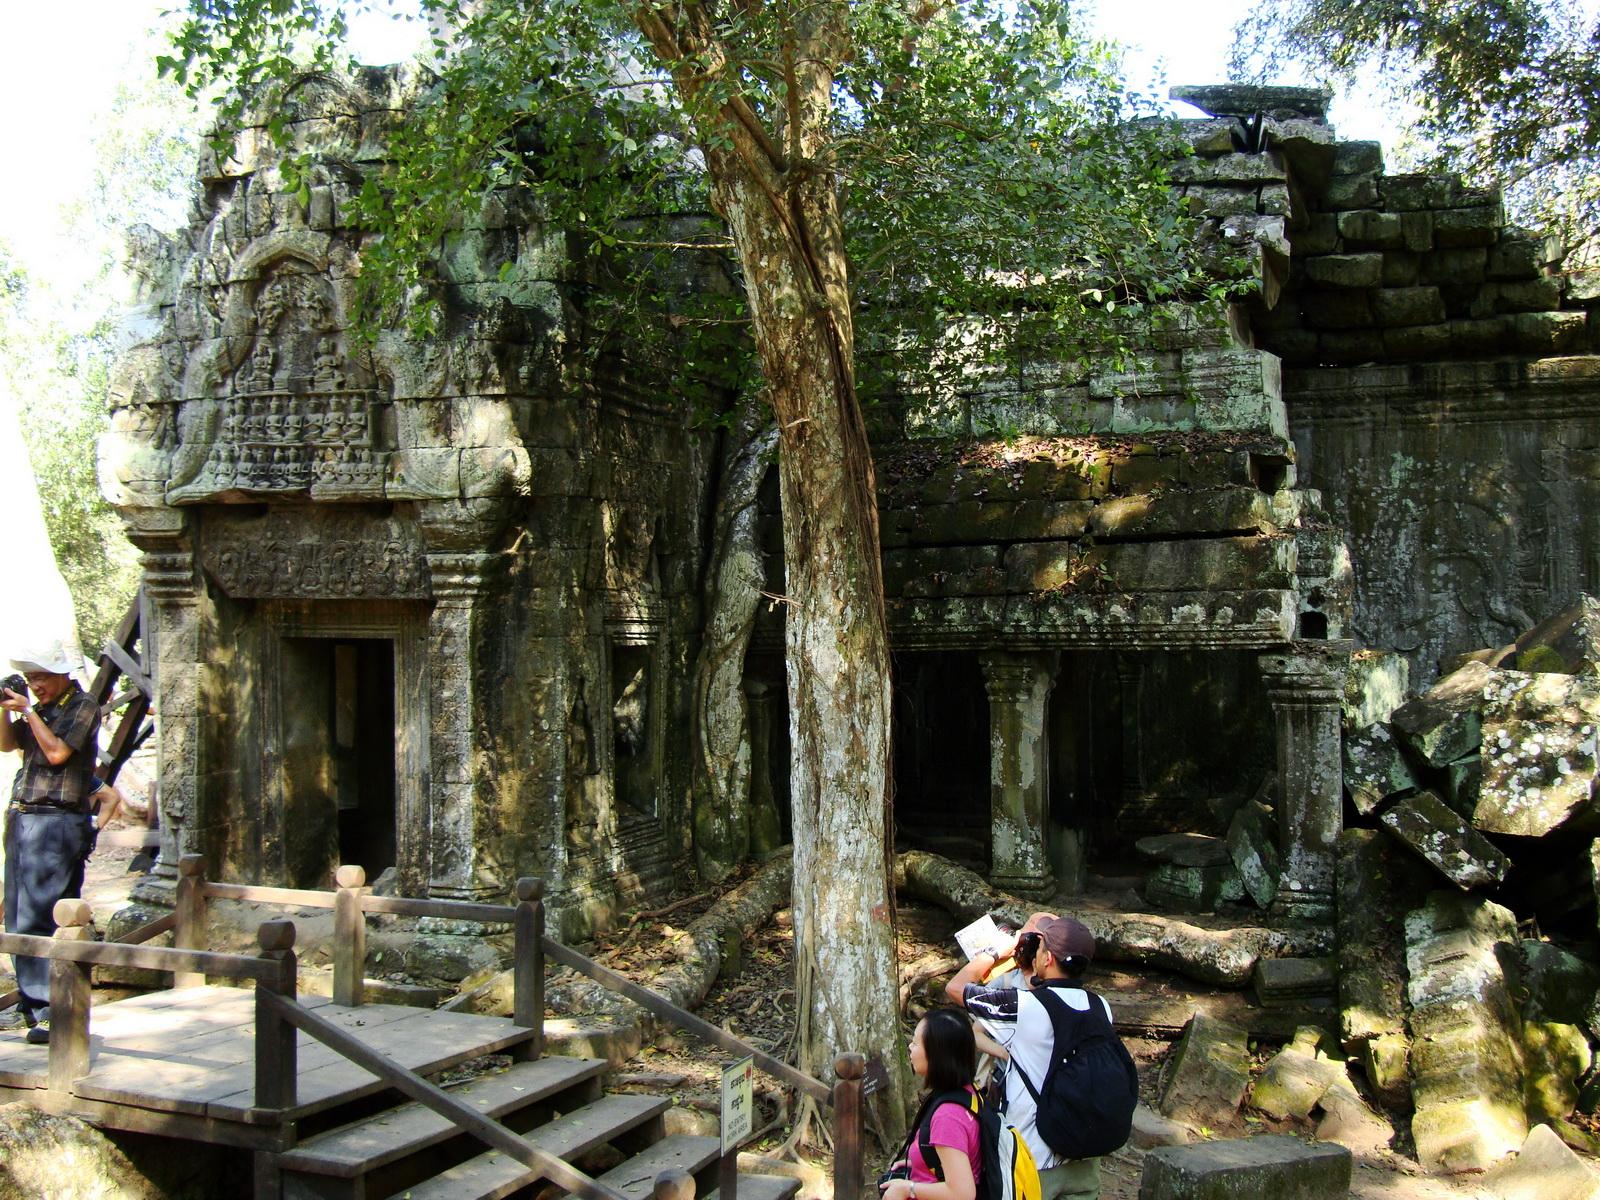 Ta Prohm Temple Rajavihara Tomb Raider third enclosure area 13